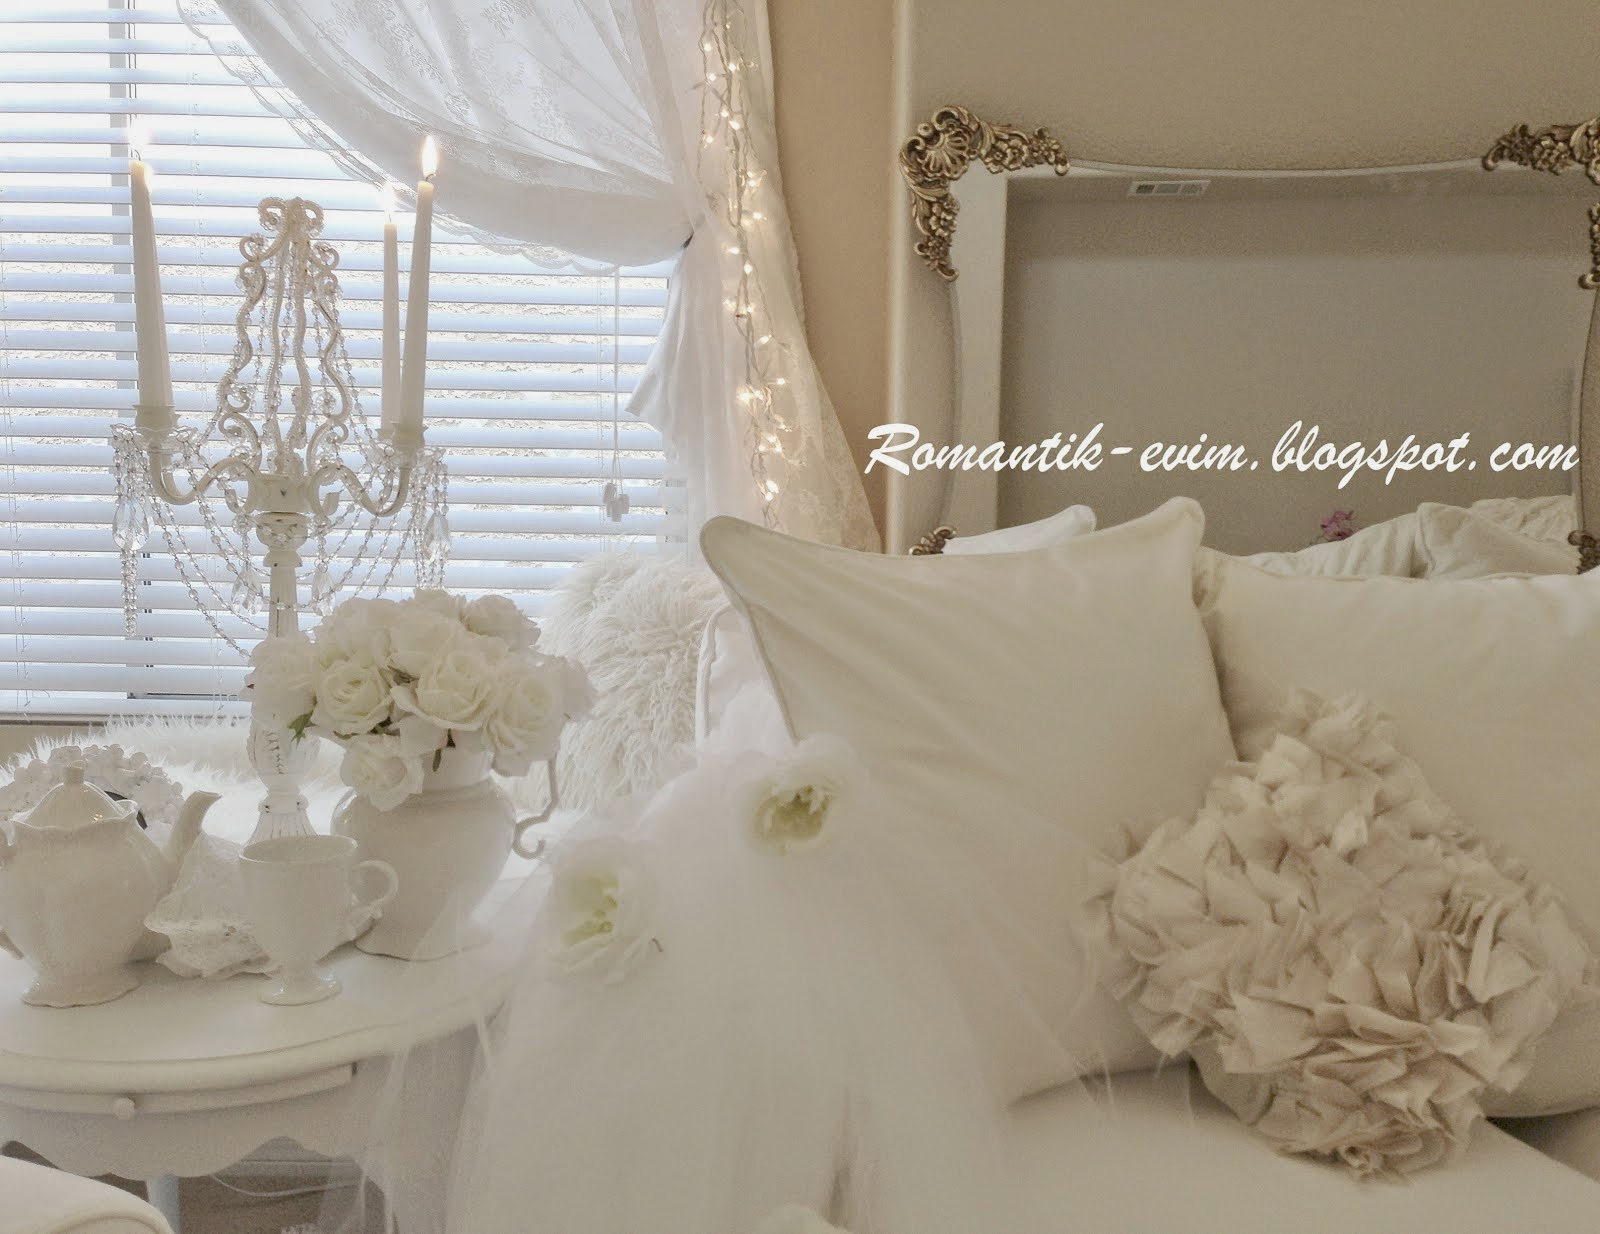 Romantic shabby chic home romantic shabby chic blog - Romantic Shabby Chic Romantic Quiet Moments